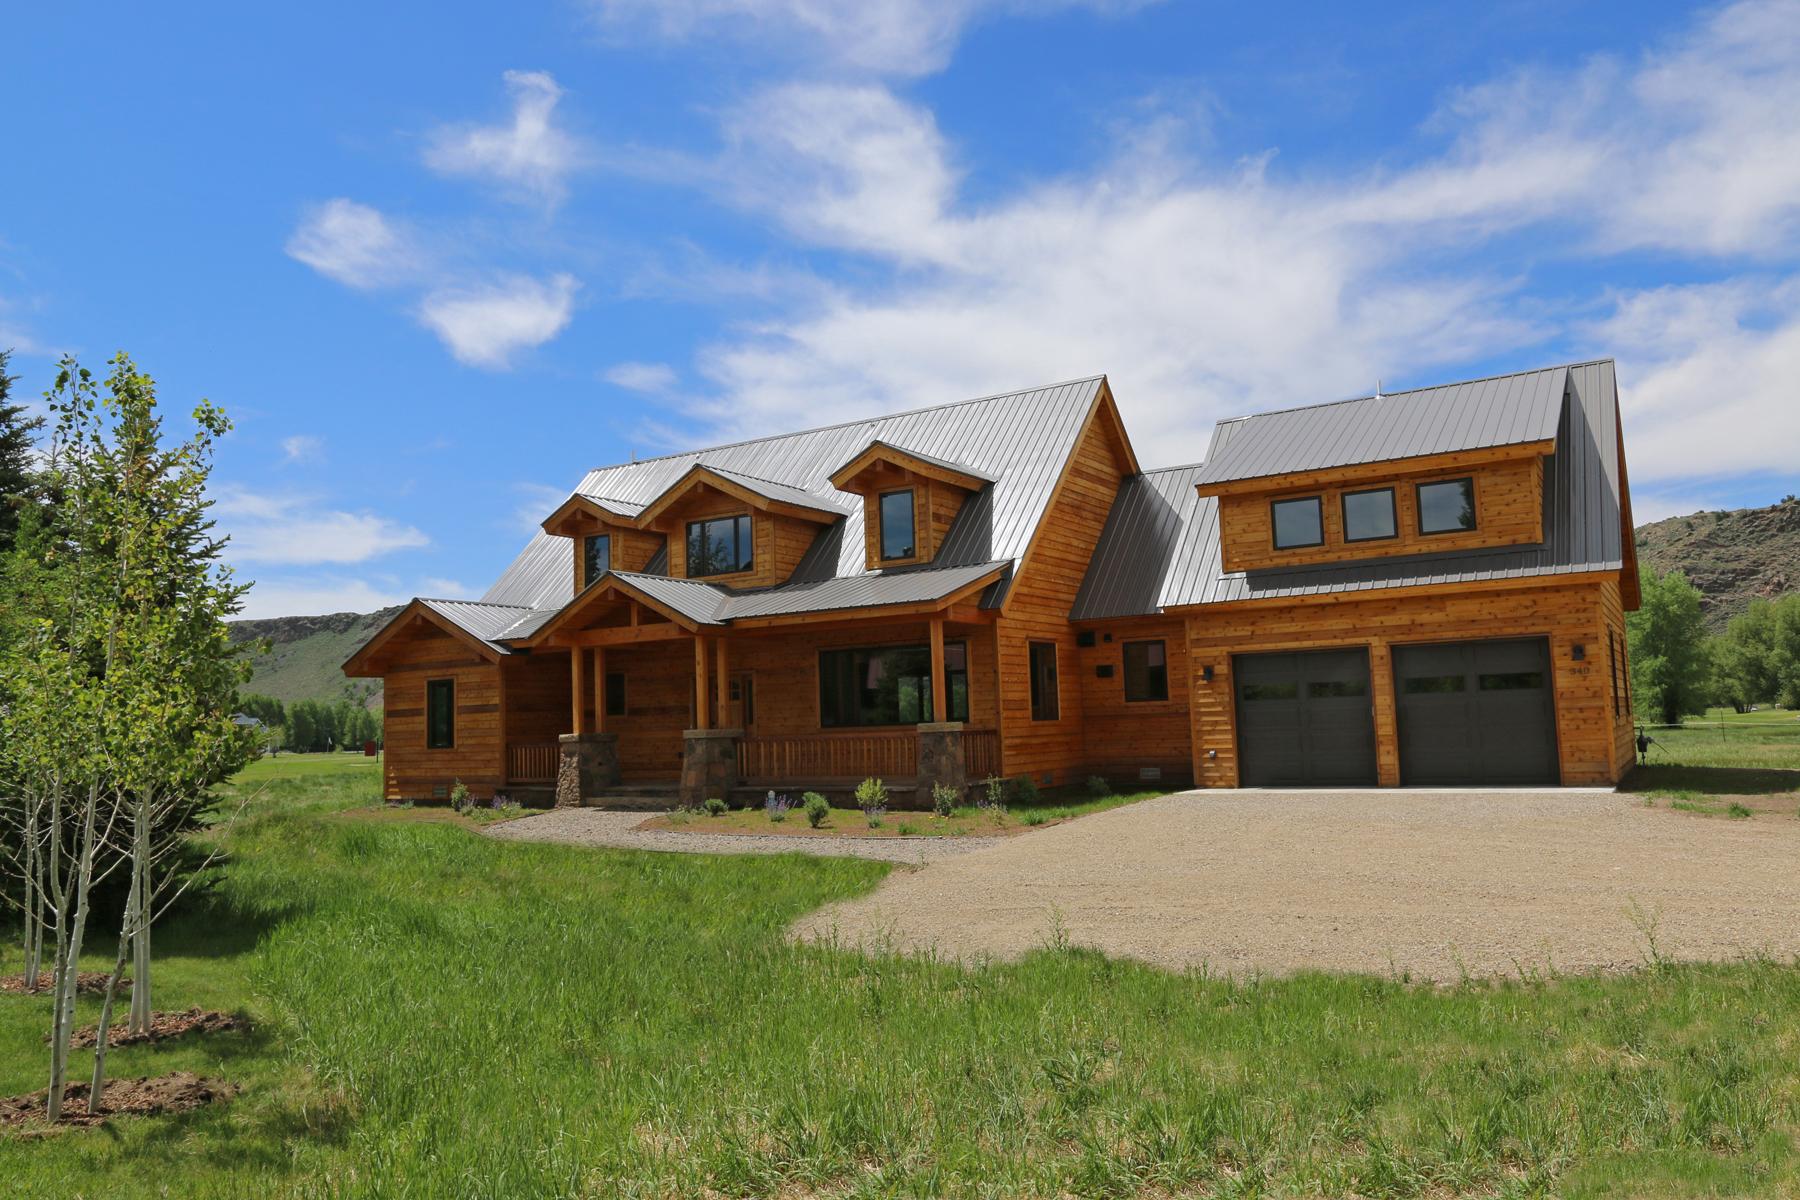 واحد منزل الأسرة للـ Sale في New Construction Located on the 17th Hole of Dos Rios Golf Club 340 Tomichi Trail Gunnison, Colorado, 81230 United States